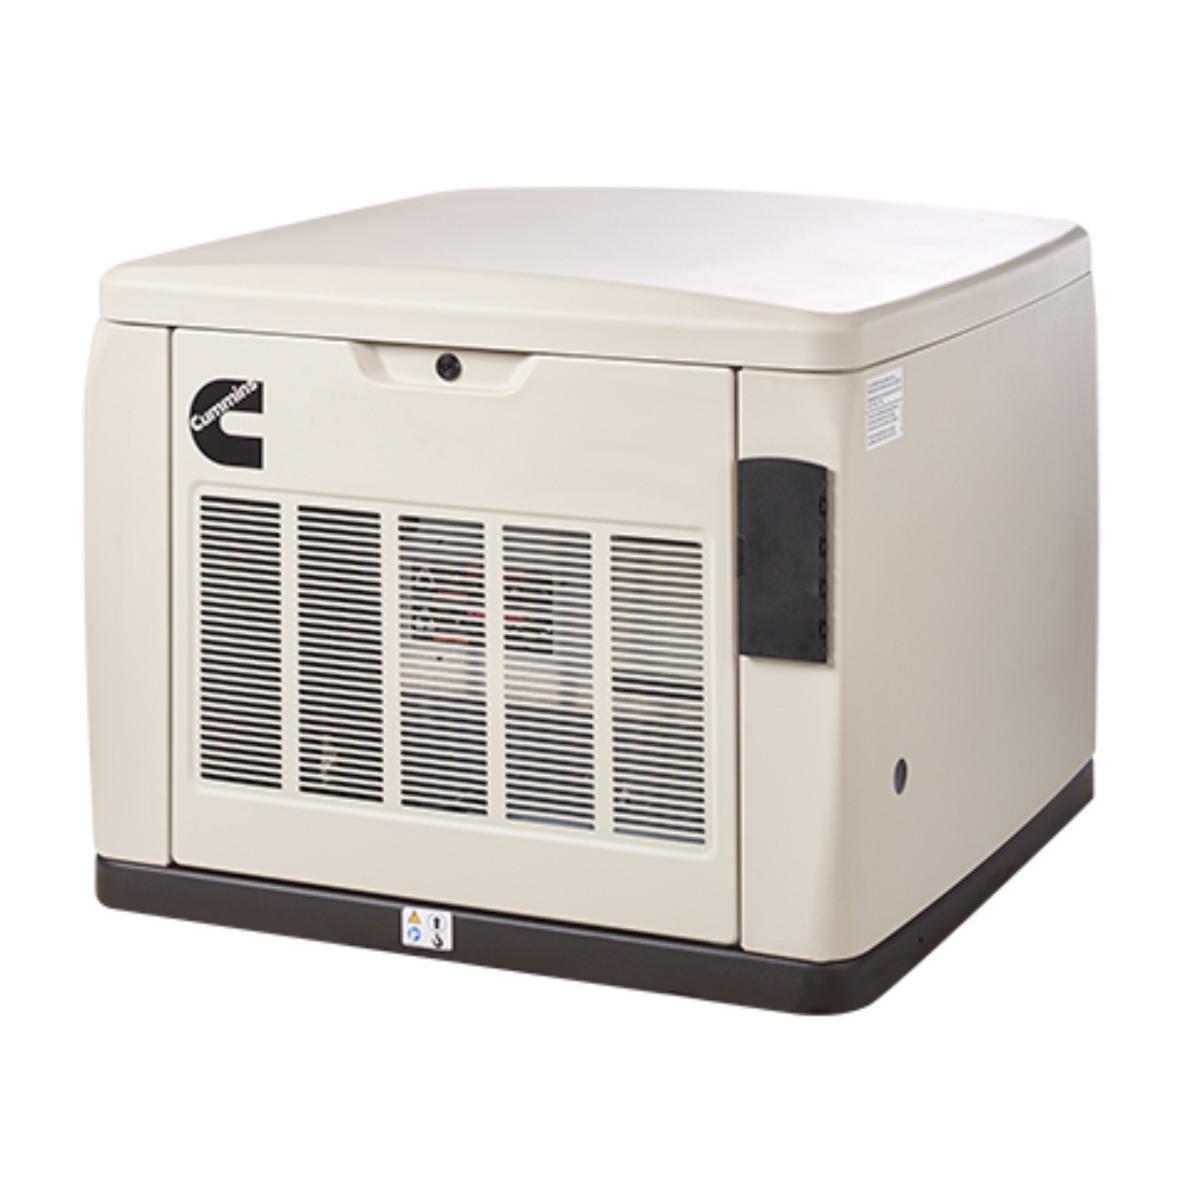 hight resolution of cummins rs17a 17kw quiet connect series cummins power generation generator